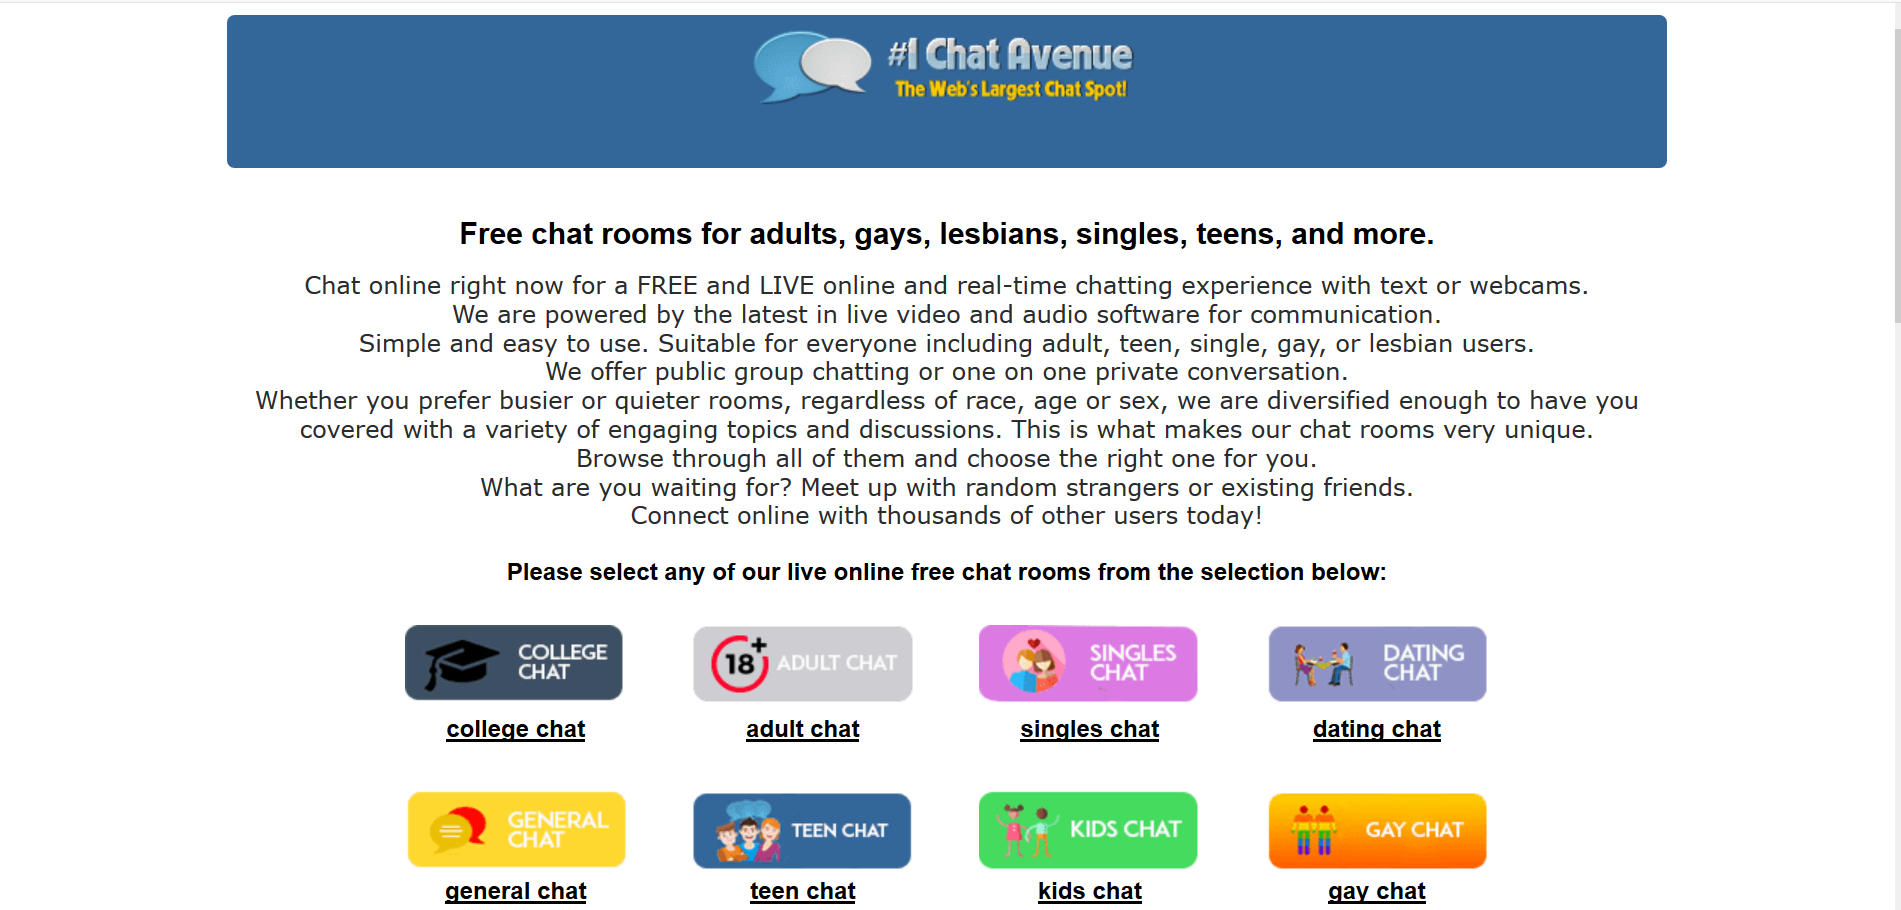 Chat-avenue: Un clásico del chat de texto, renovado